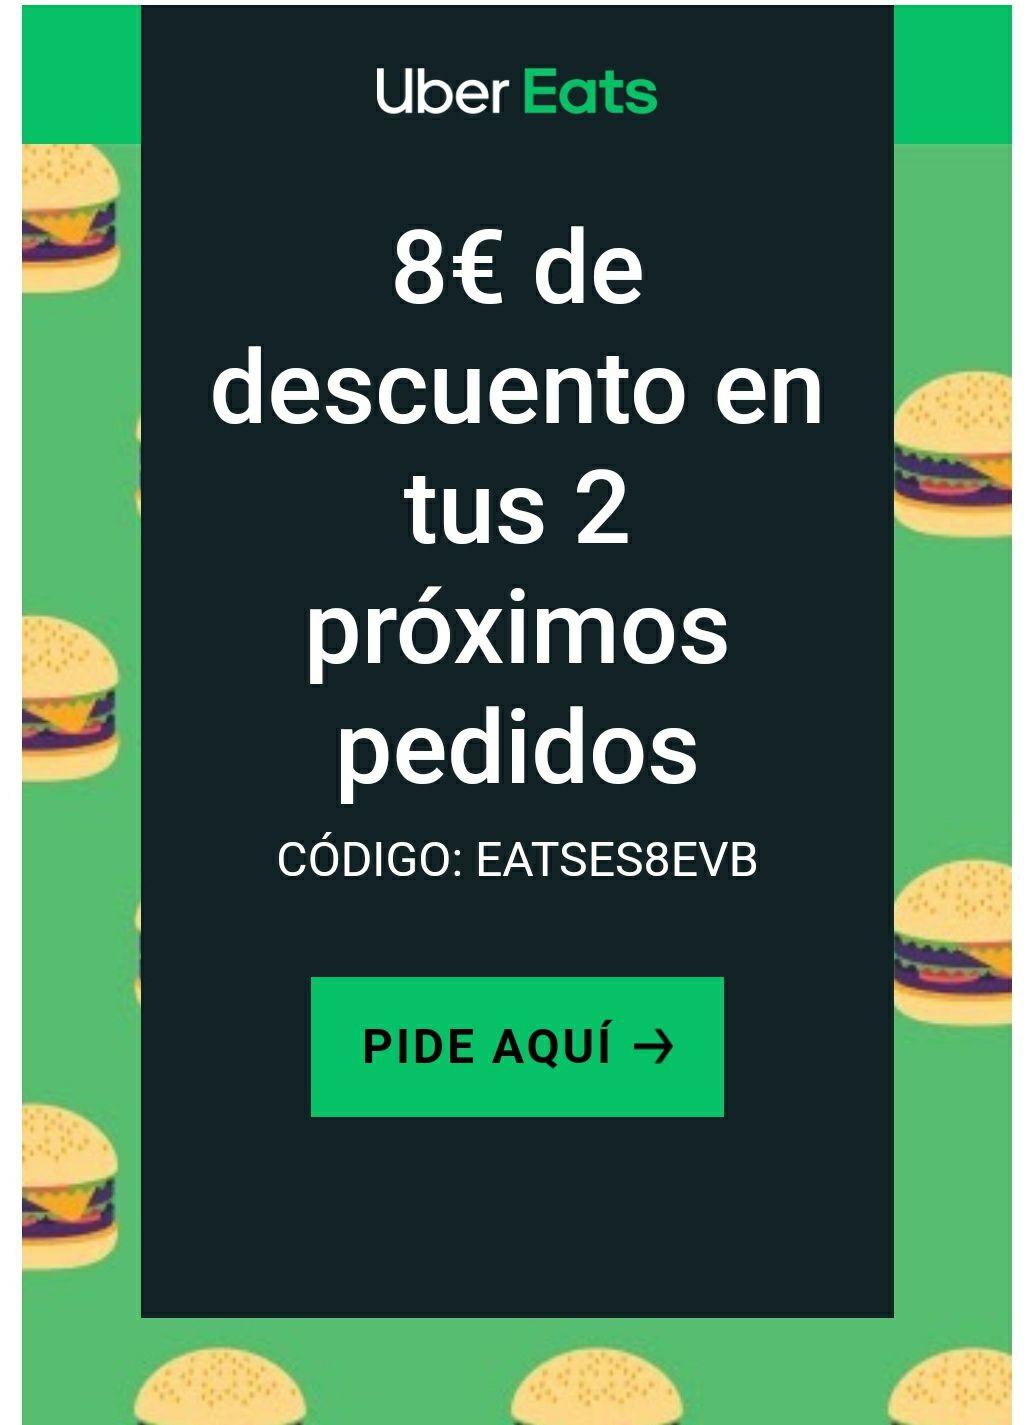 -8€ Uber Eats en 2 próximos pedidos